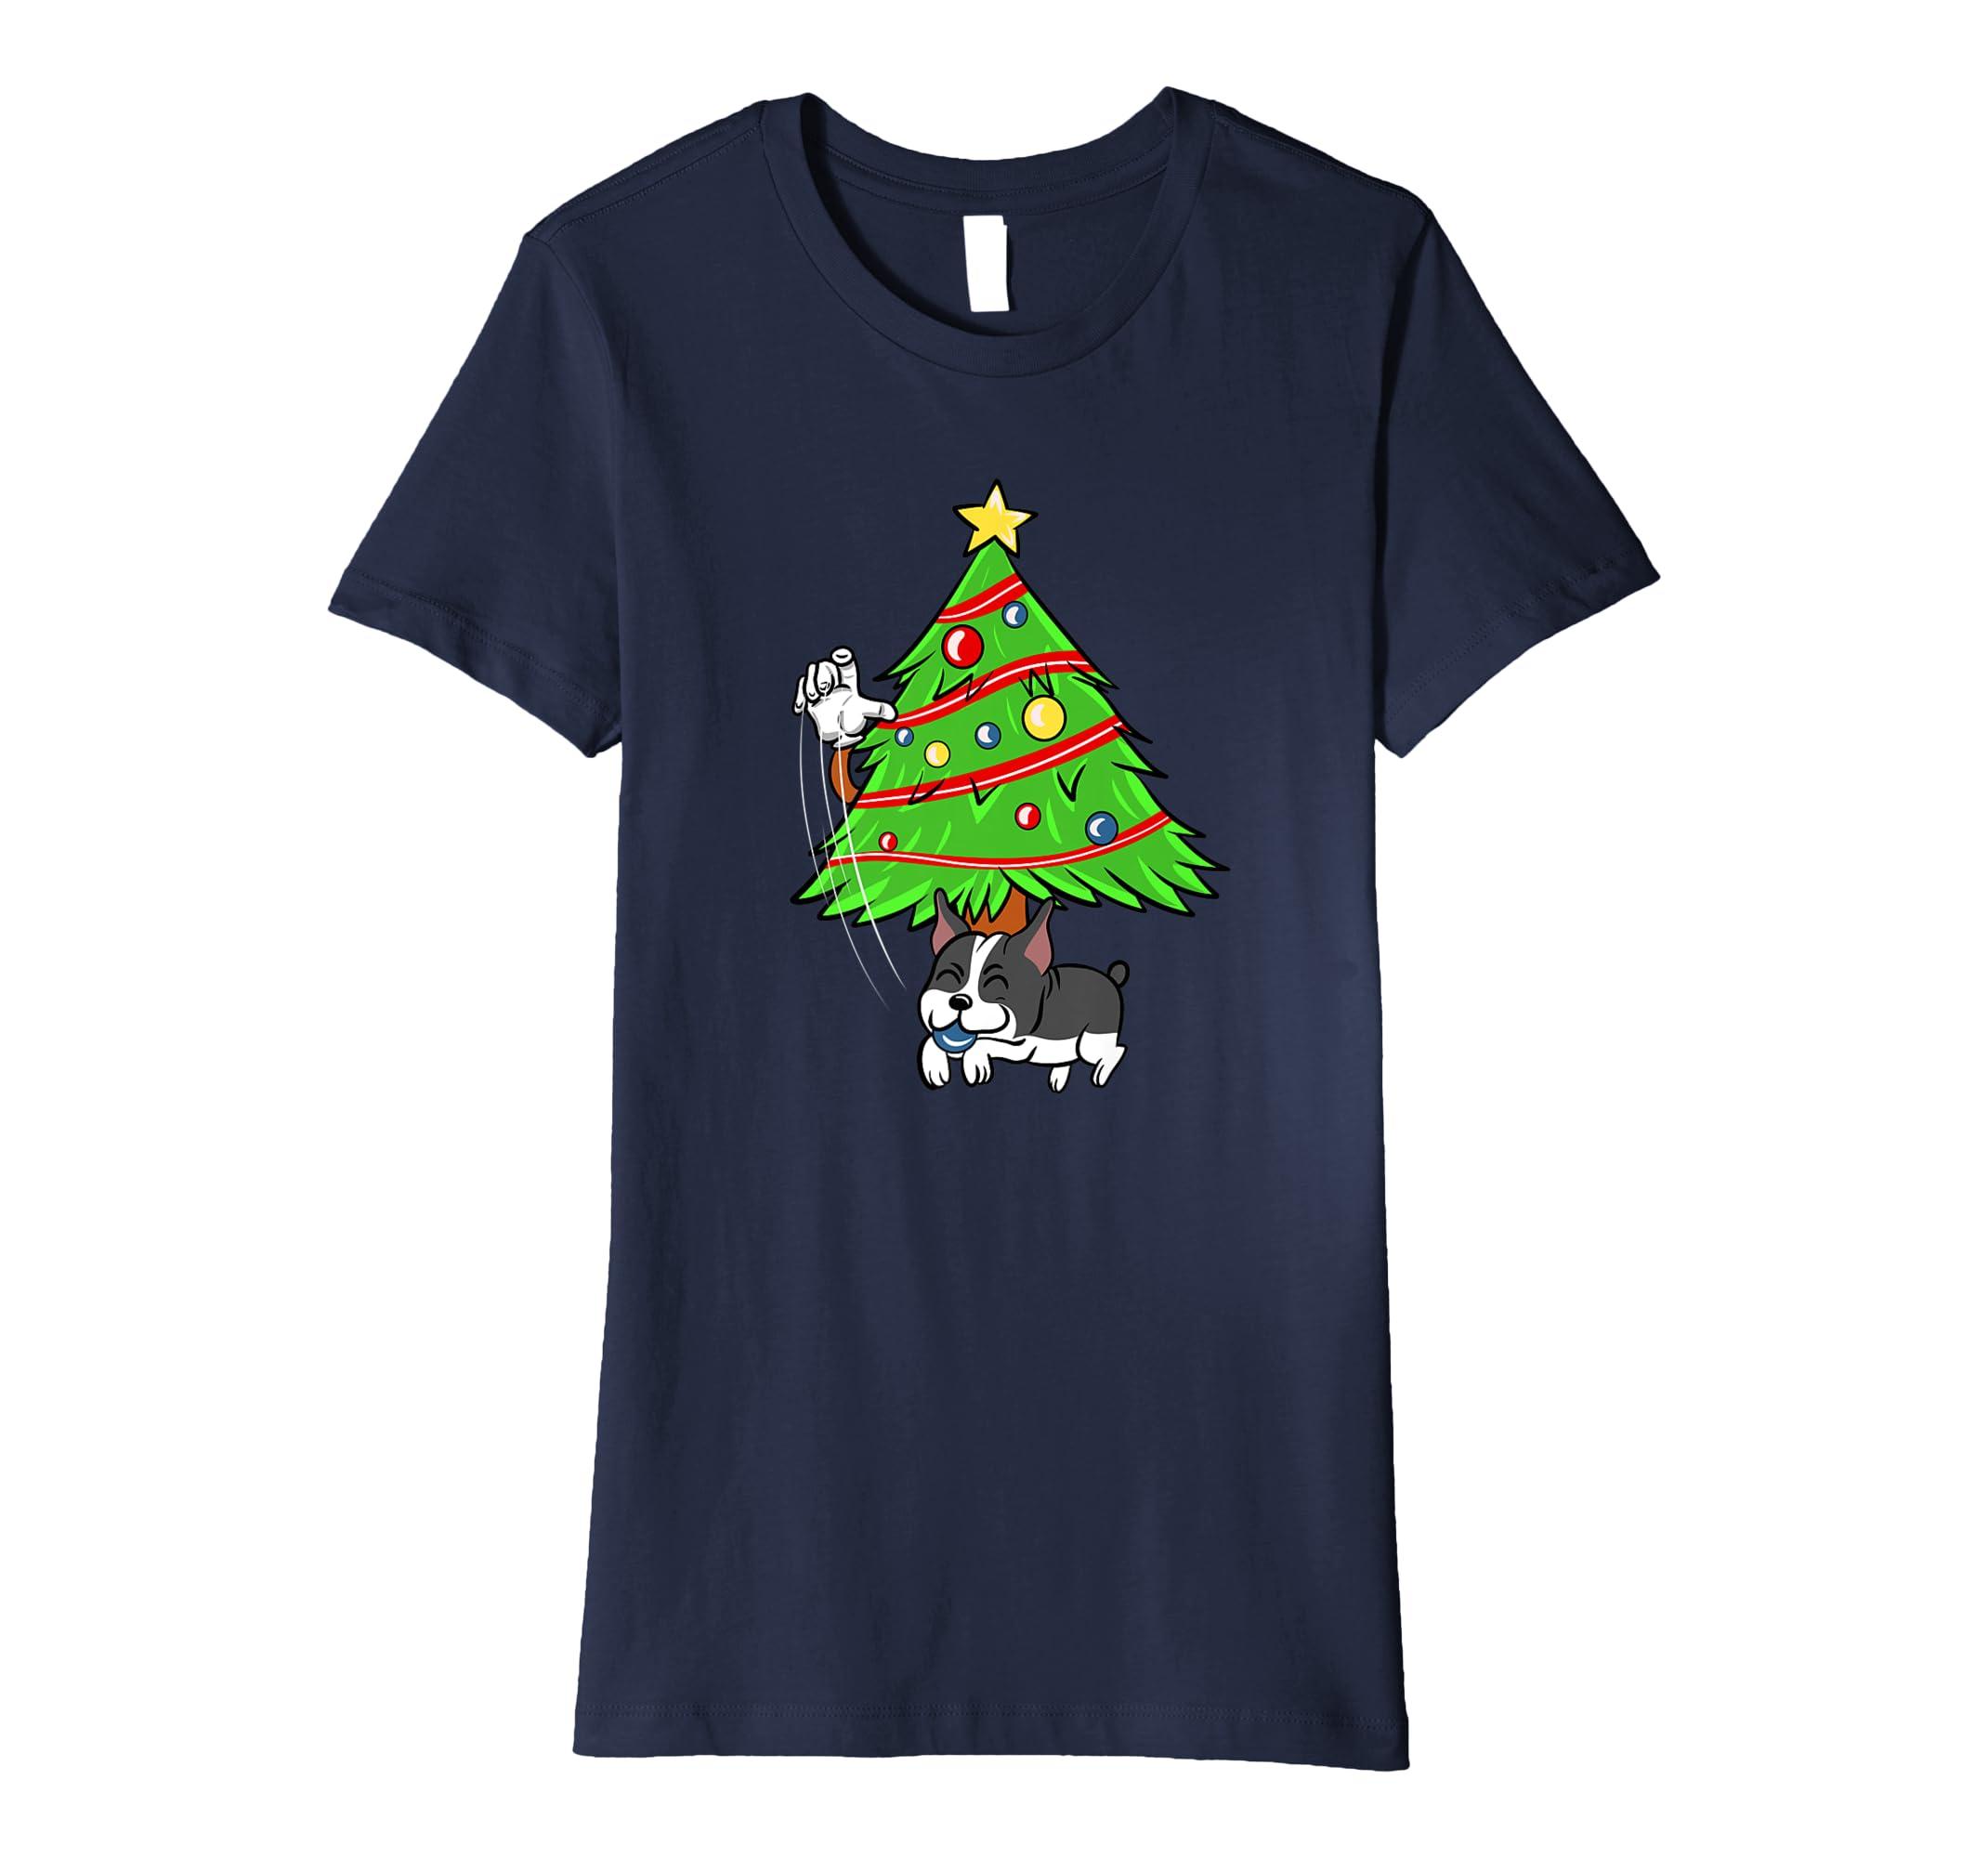 Boston Terrier Christbaumkugel Weihnachten T-Shirt: Amazon.de ...